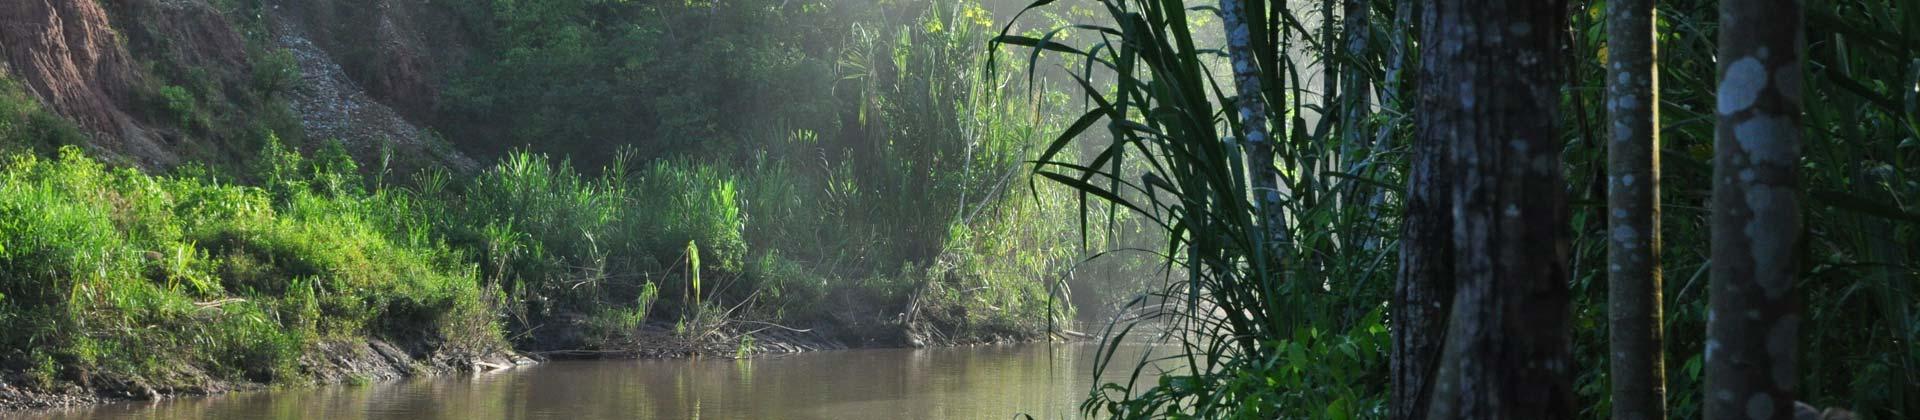 Het Amazonegebied